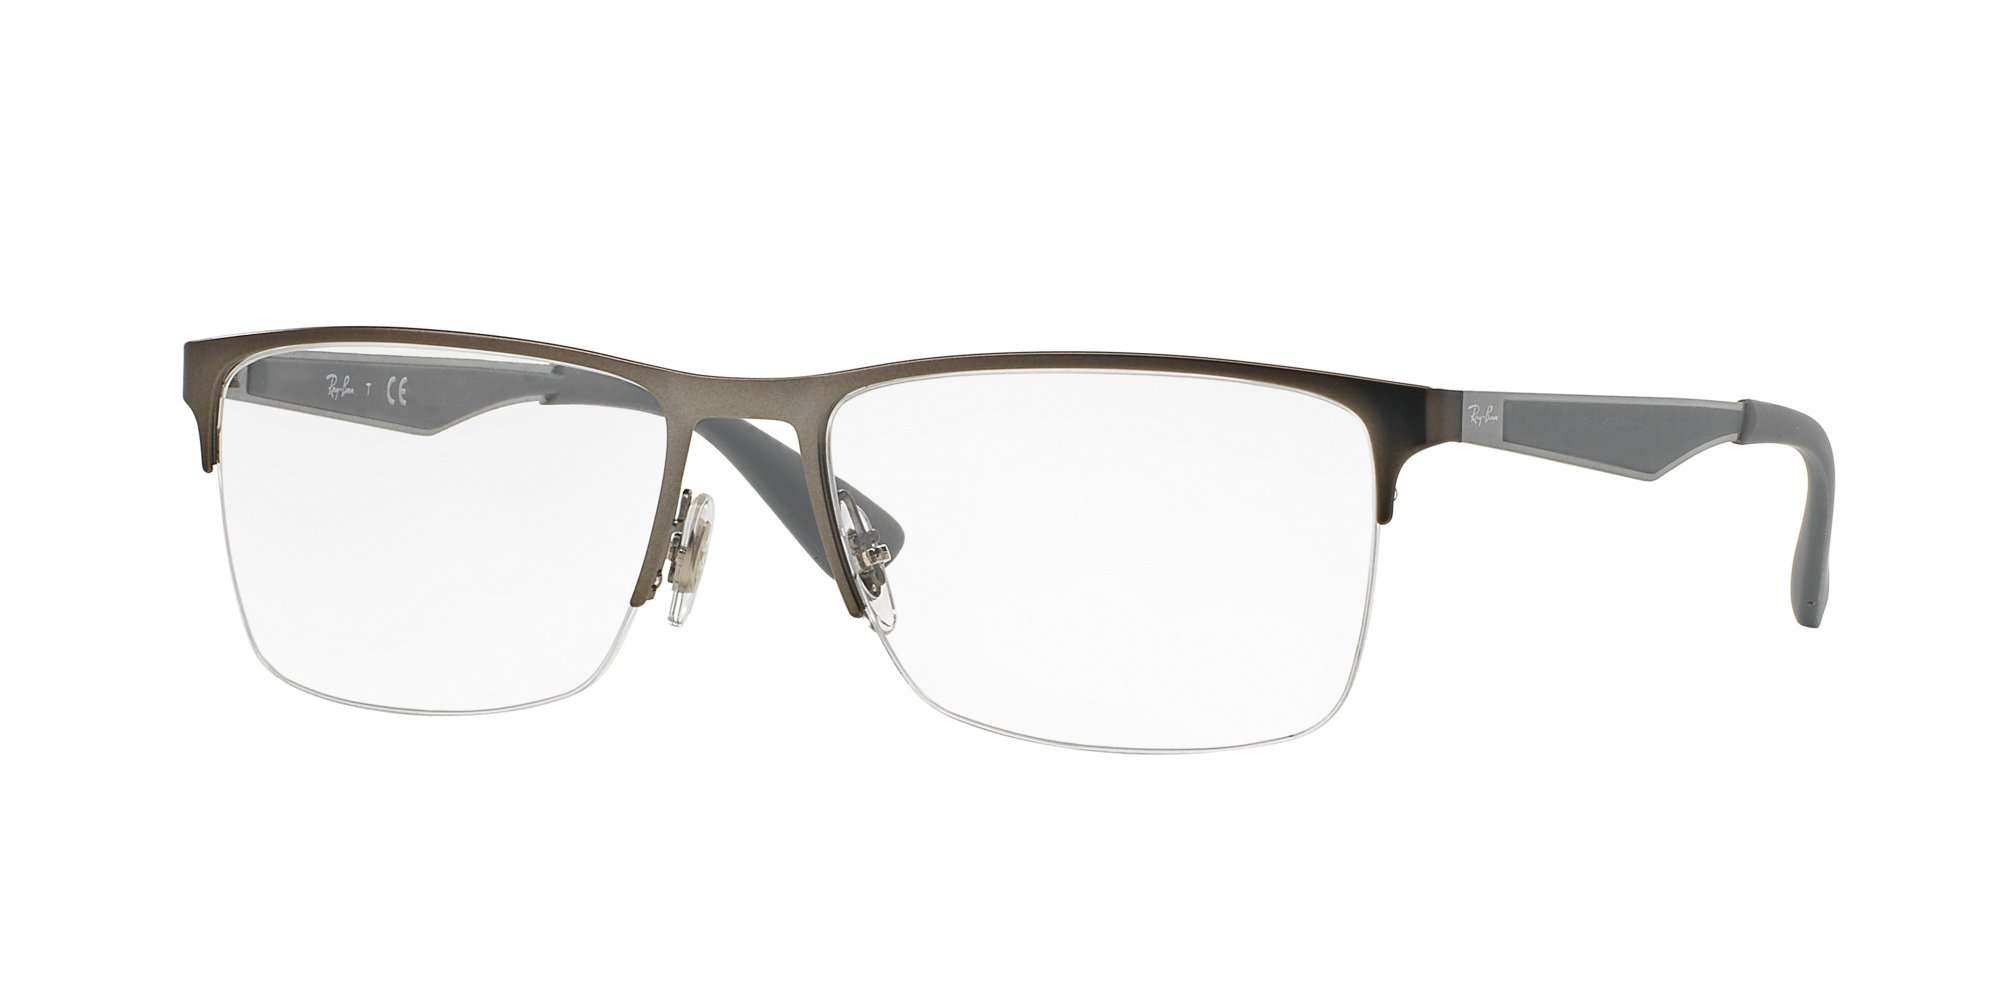 Ray-Ban RX6335 Rectangular Metal Eyeglass Frames, Matte Gunmetal/Demo Lens, 56 mm by Ray-Ban